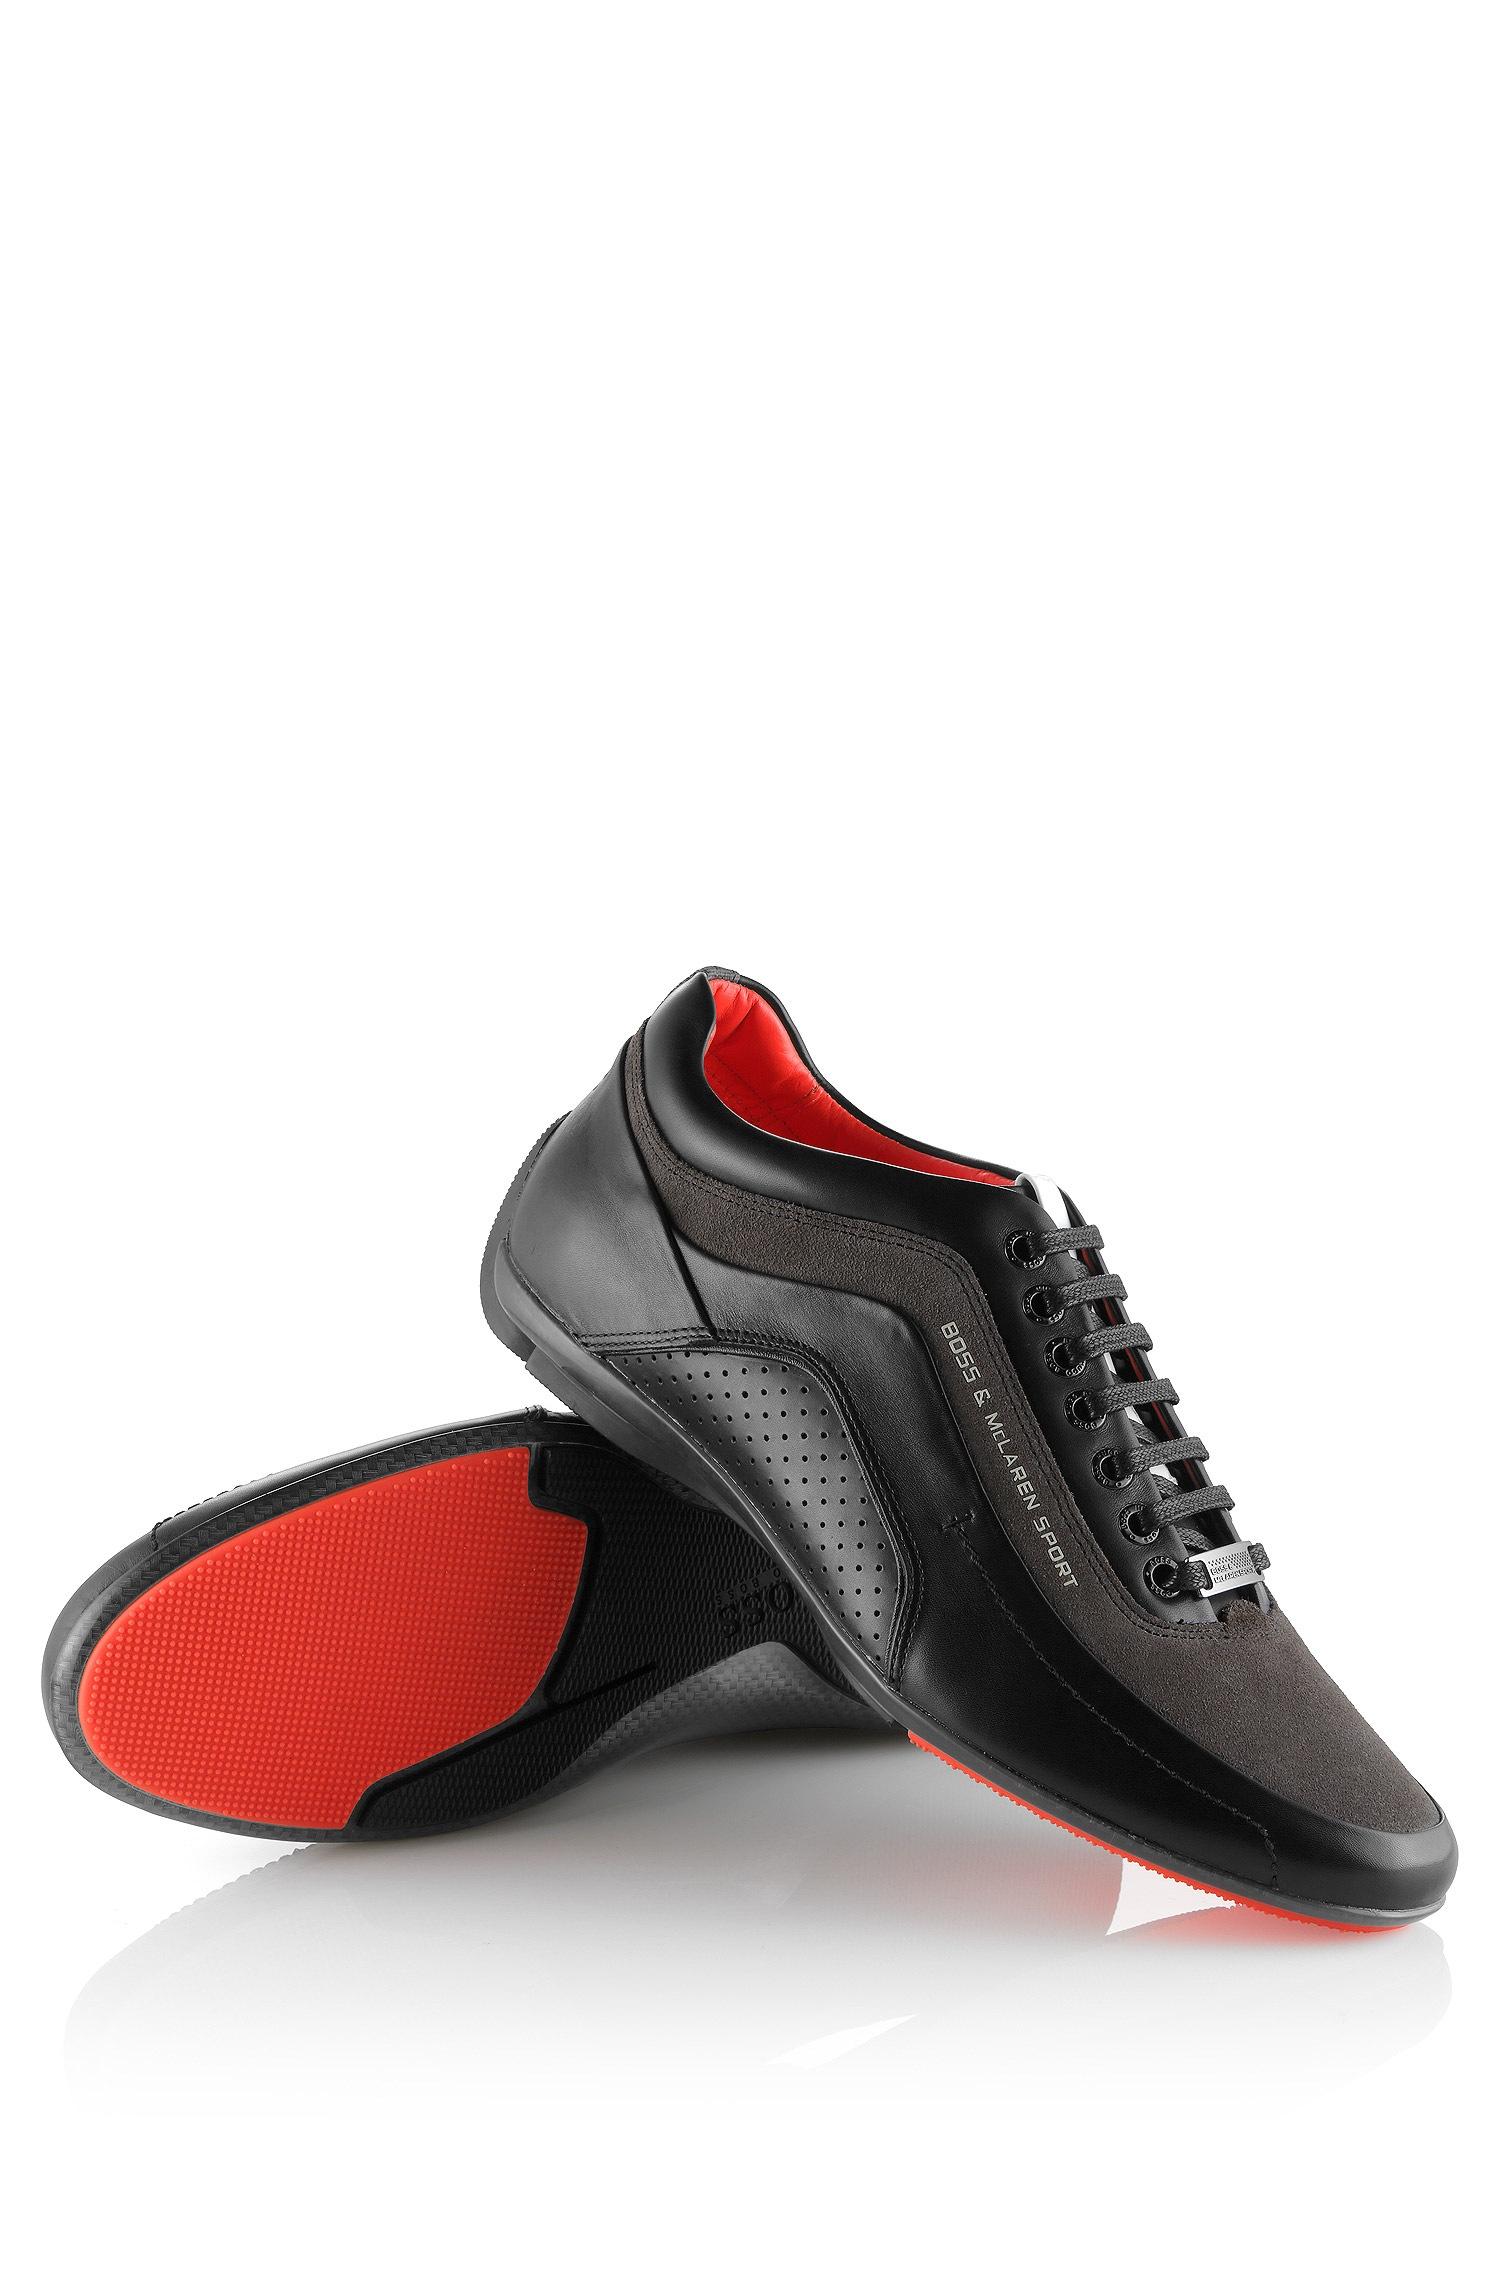 hugo boss sport shoes - photo #1